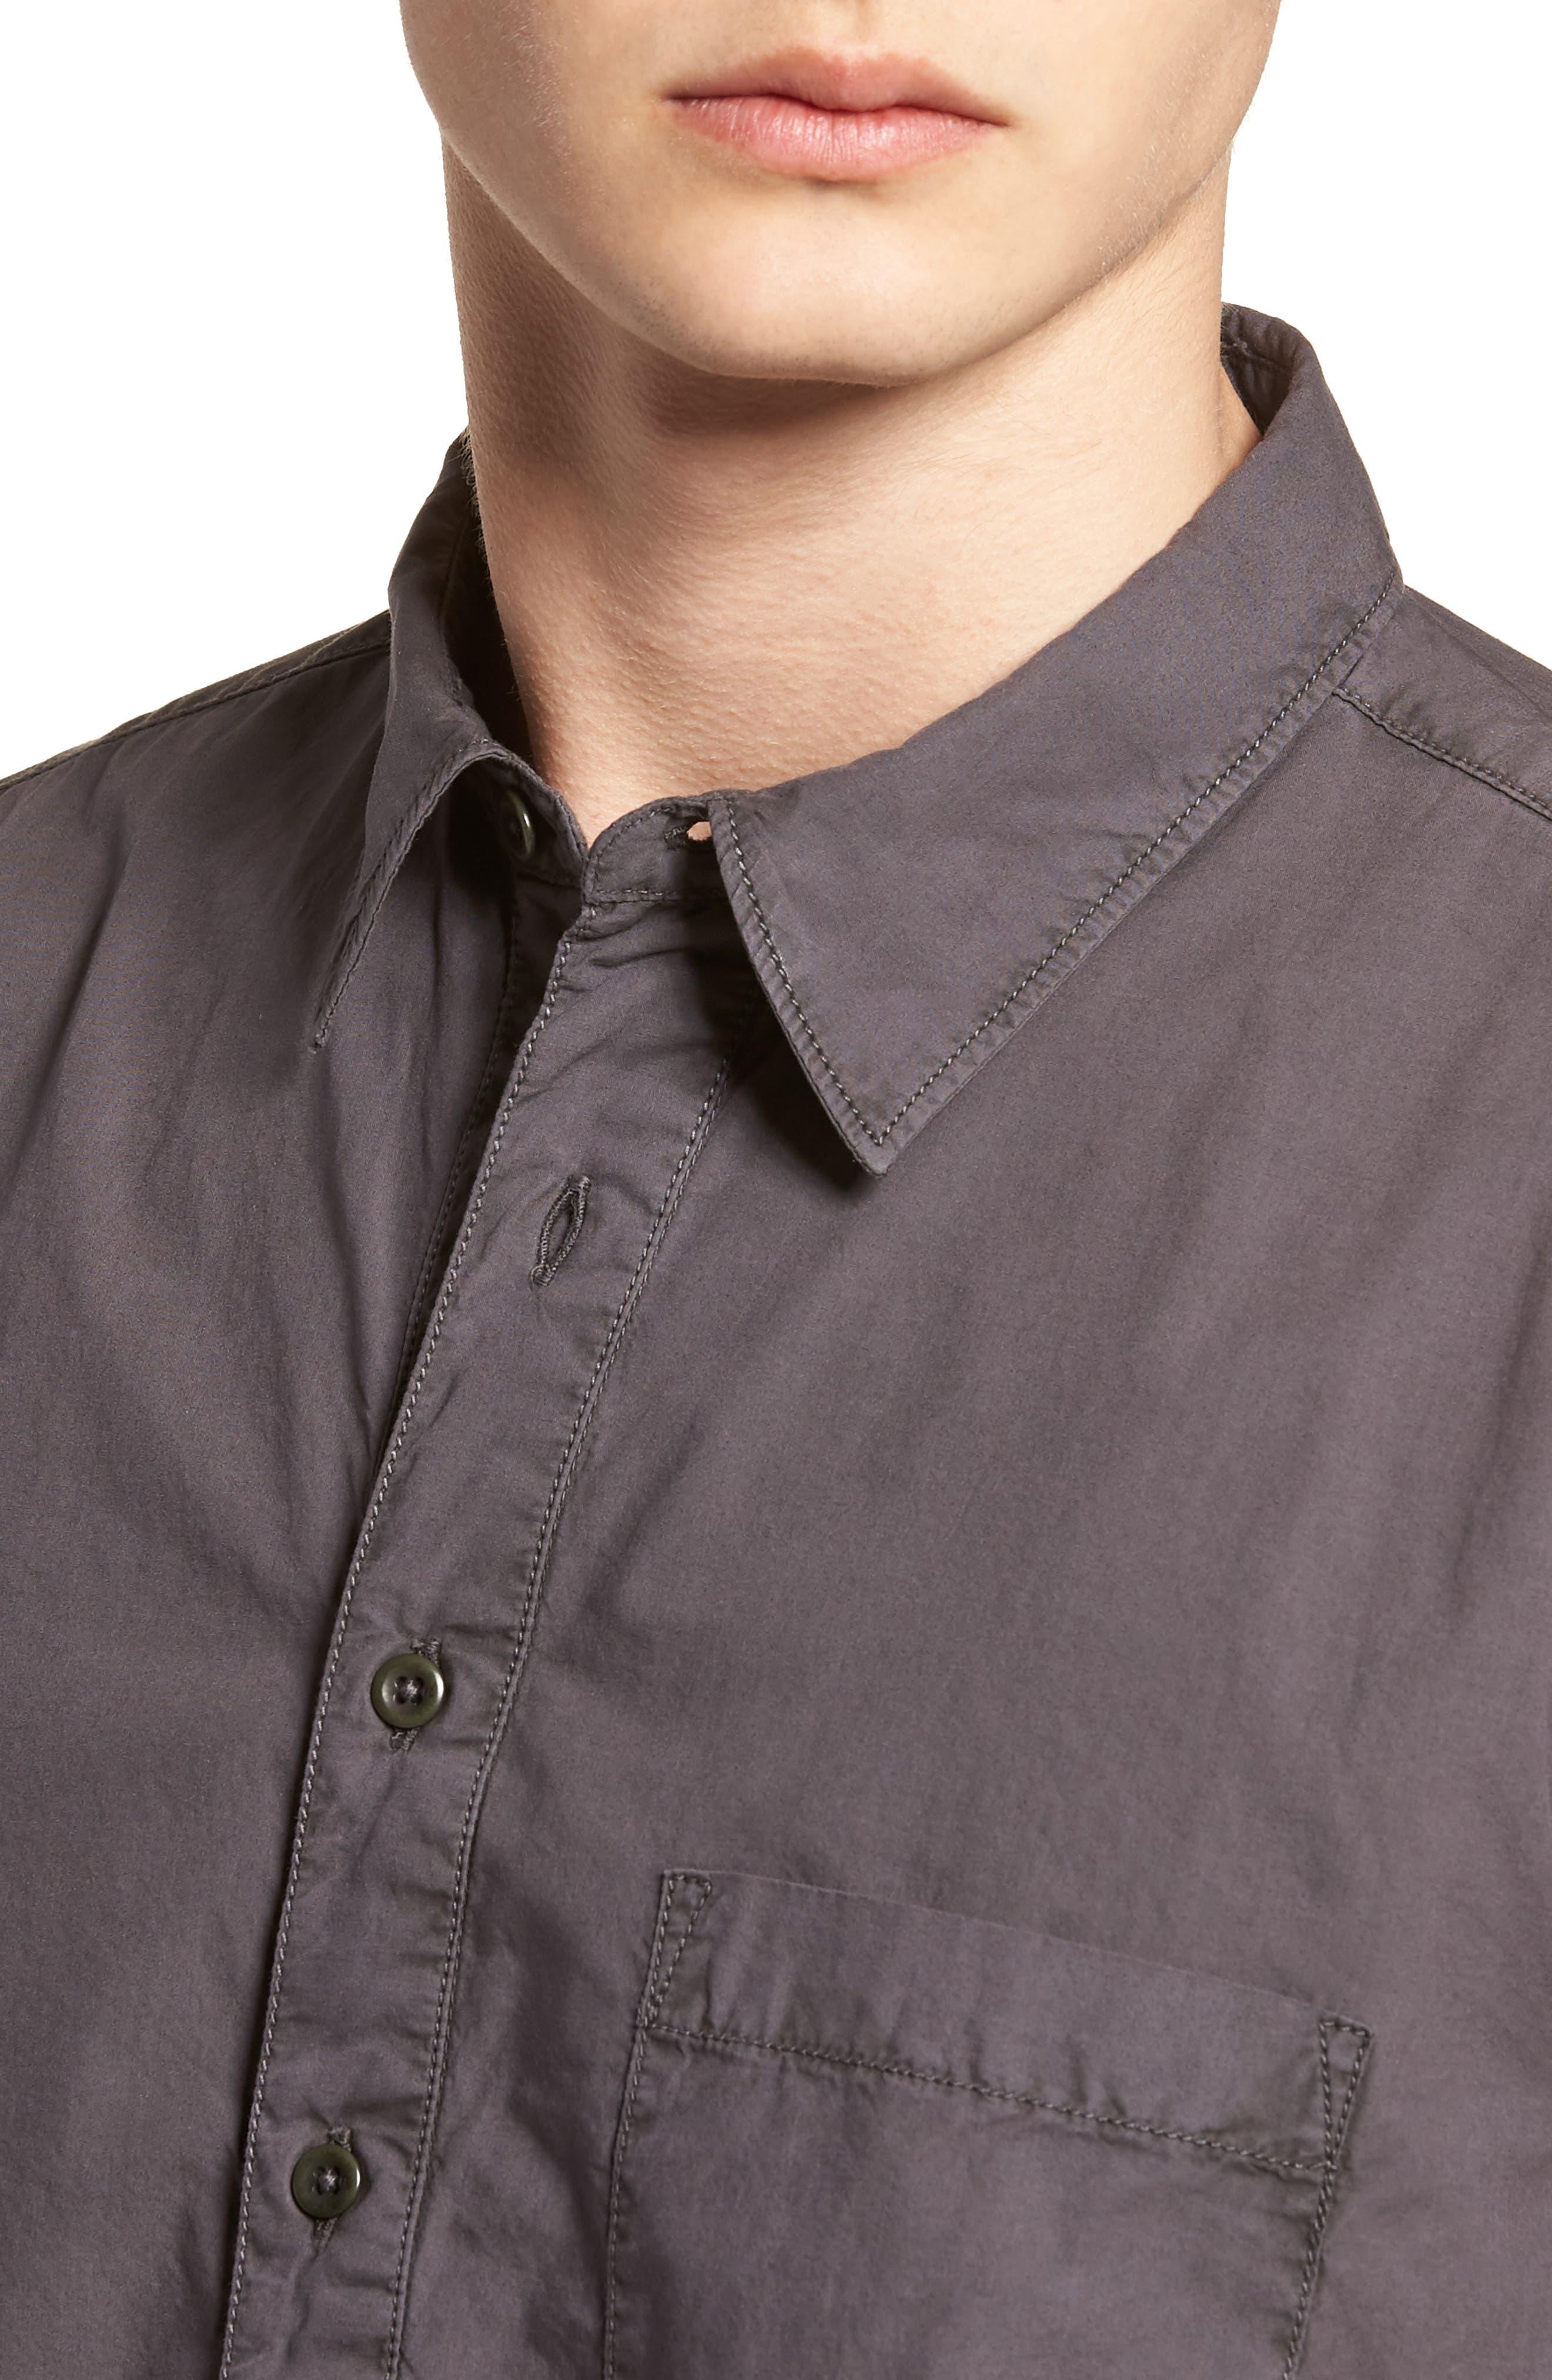 Regular Fit Garment Dyed Poplin Sport Shirt,                             Alternate thumbnail 4, color,                             020